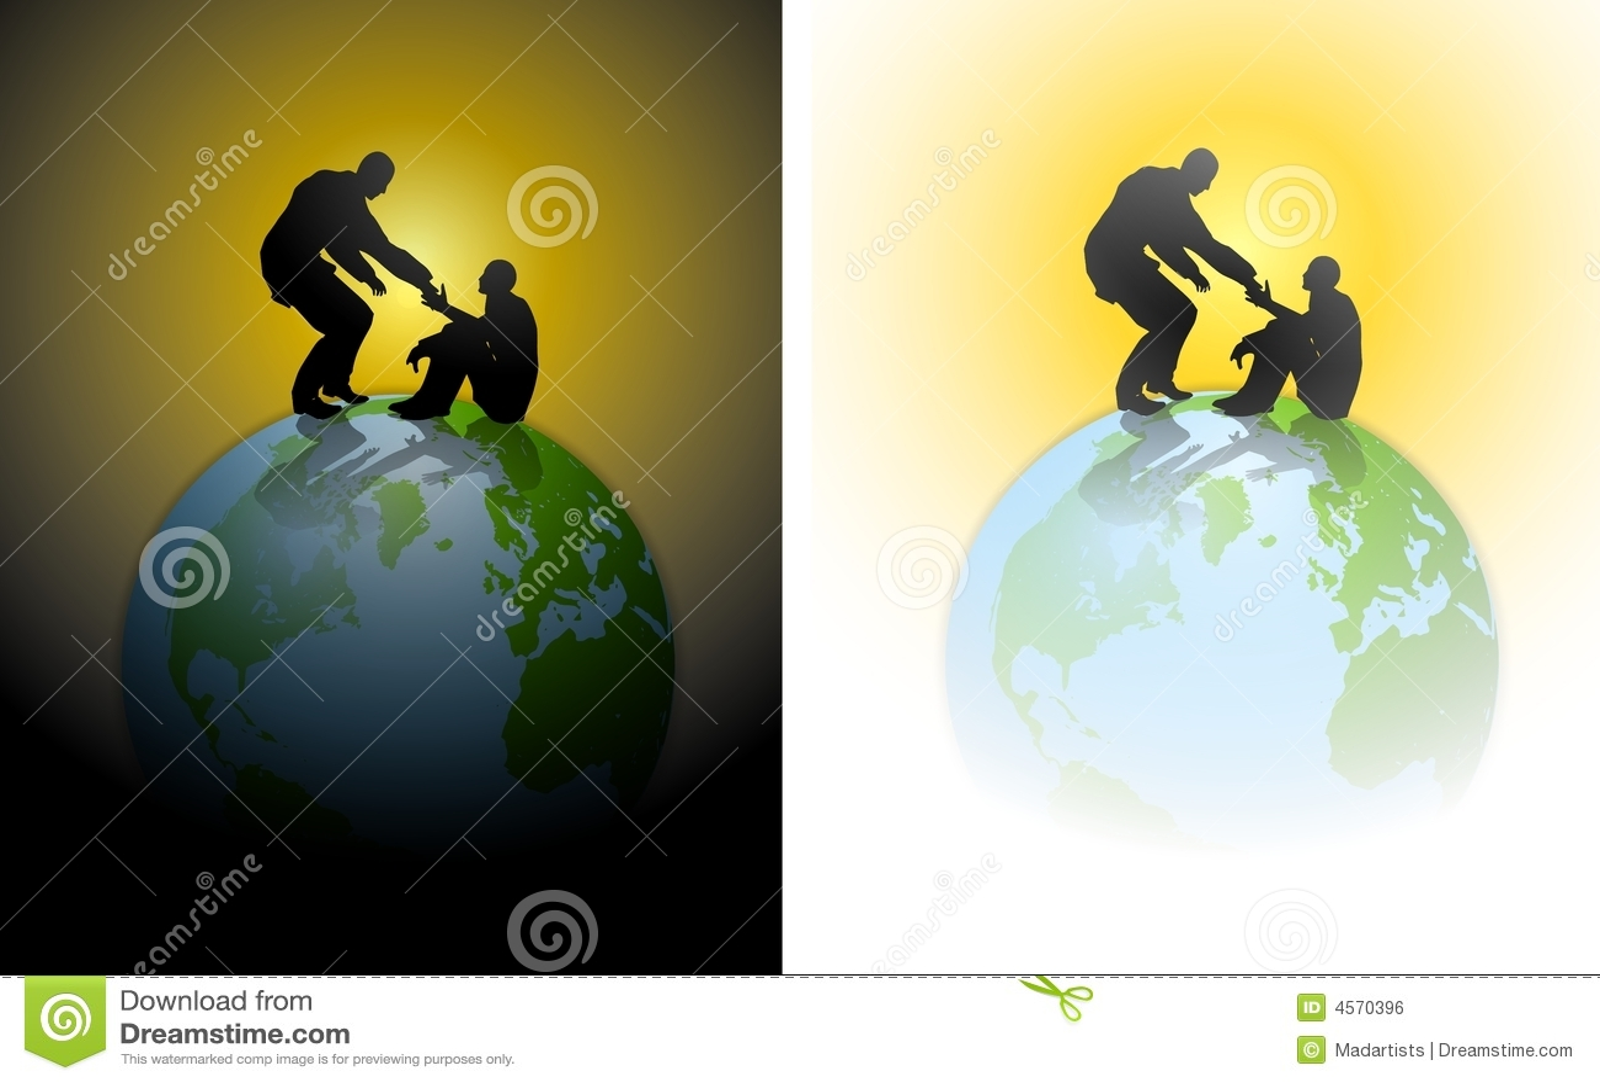 Helping Earth